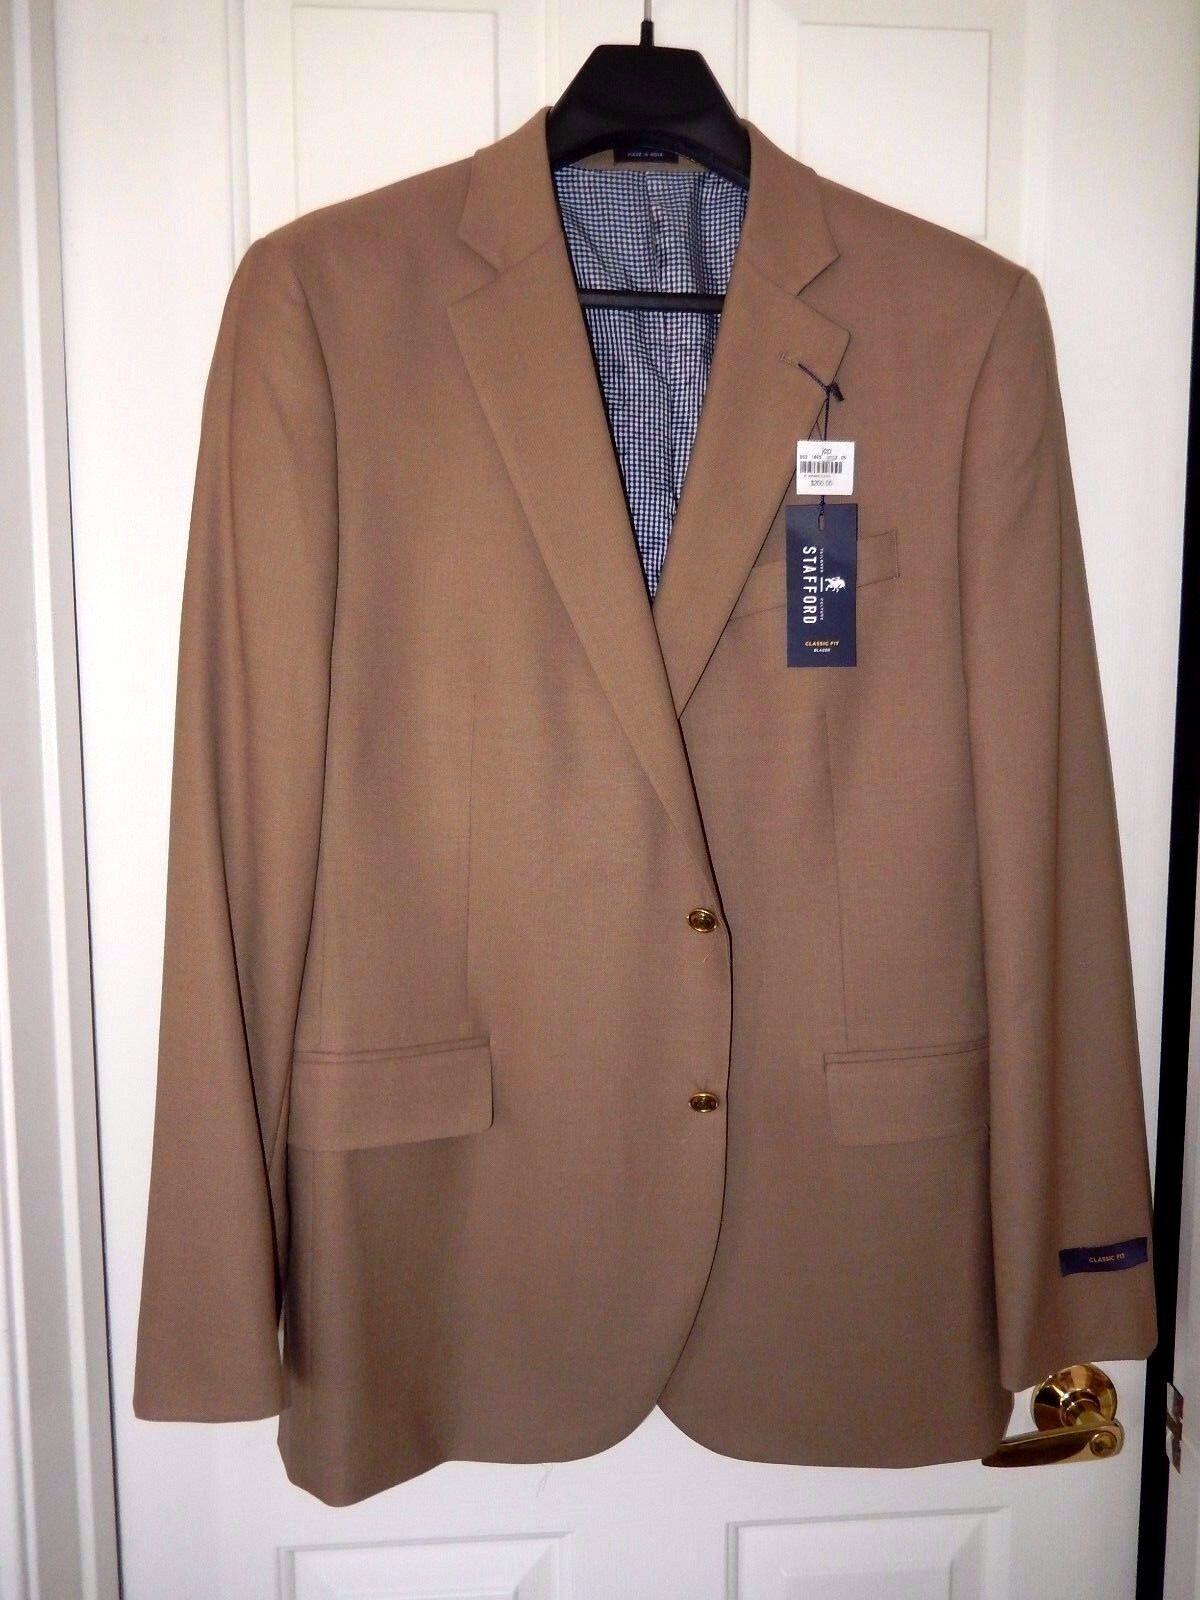 Stafford Classic Fit Wool Blazer--Größe 46 L, tan-NWT 200--Gold logo buttons